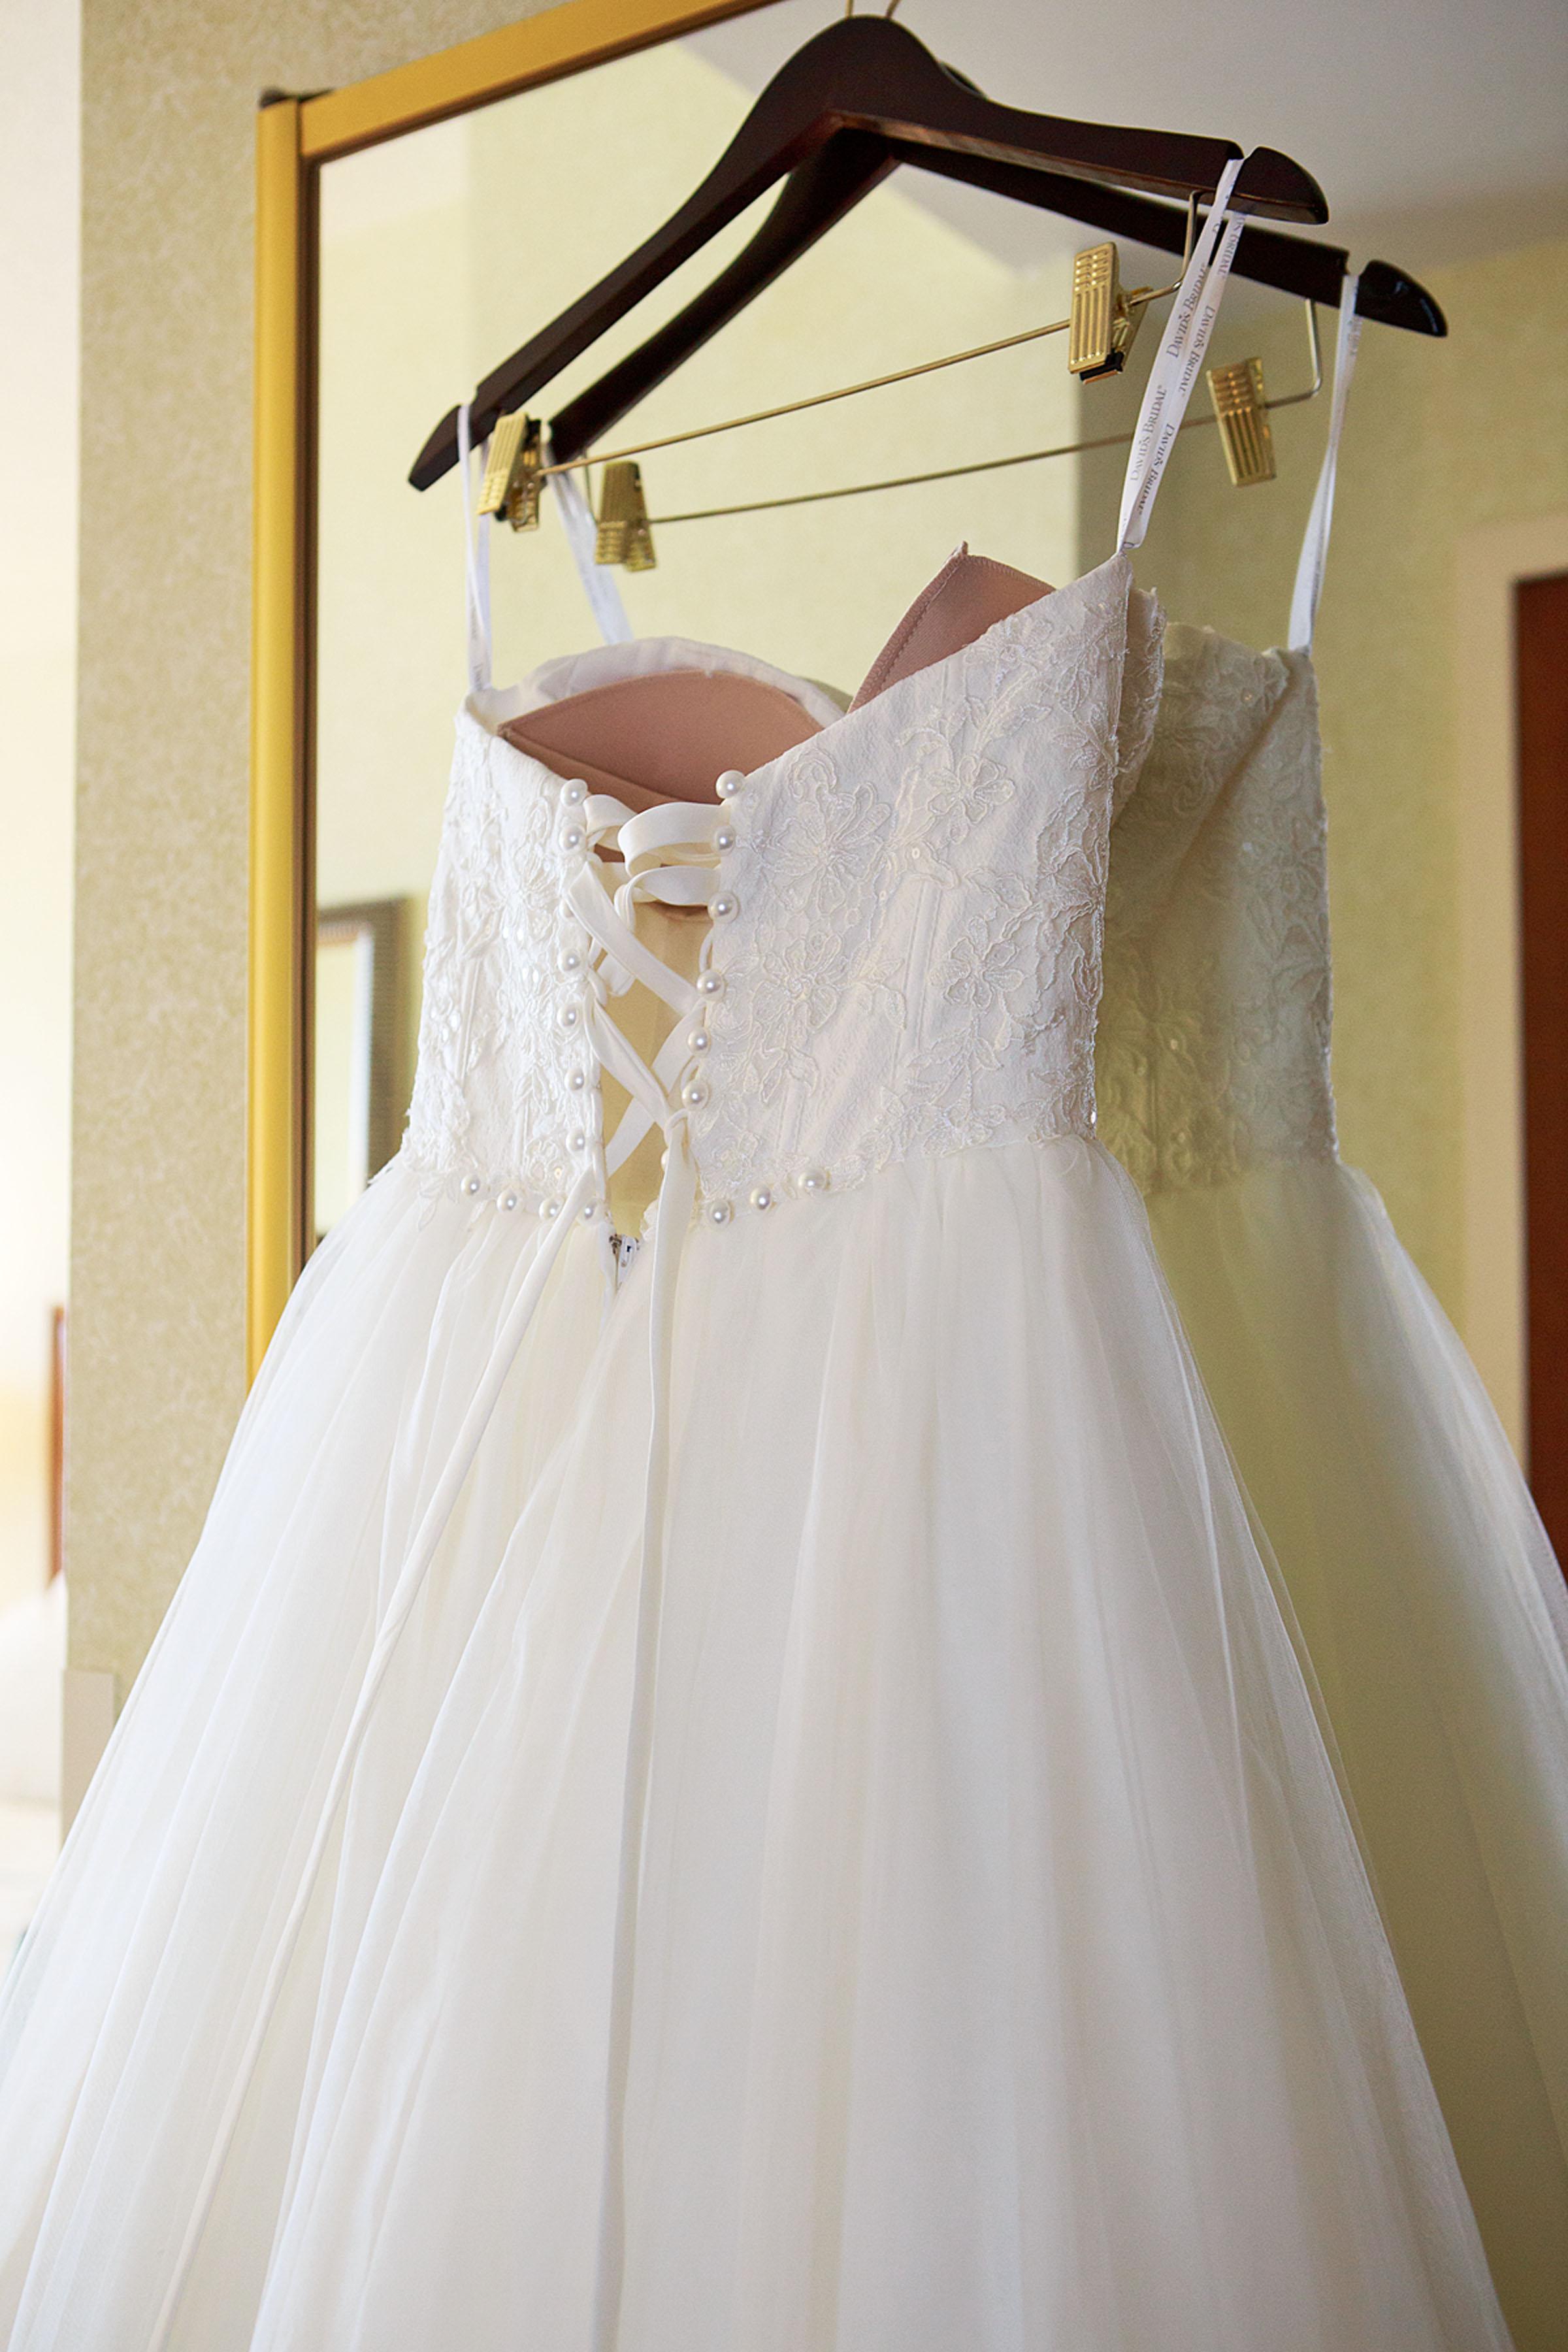 North_Carolina_Wedding_Photographer_Tiffany_Abruzzo_Girls Prep_013.jpg